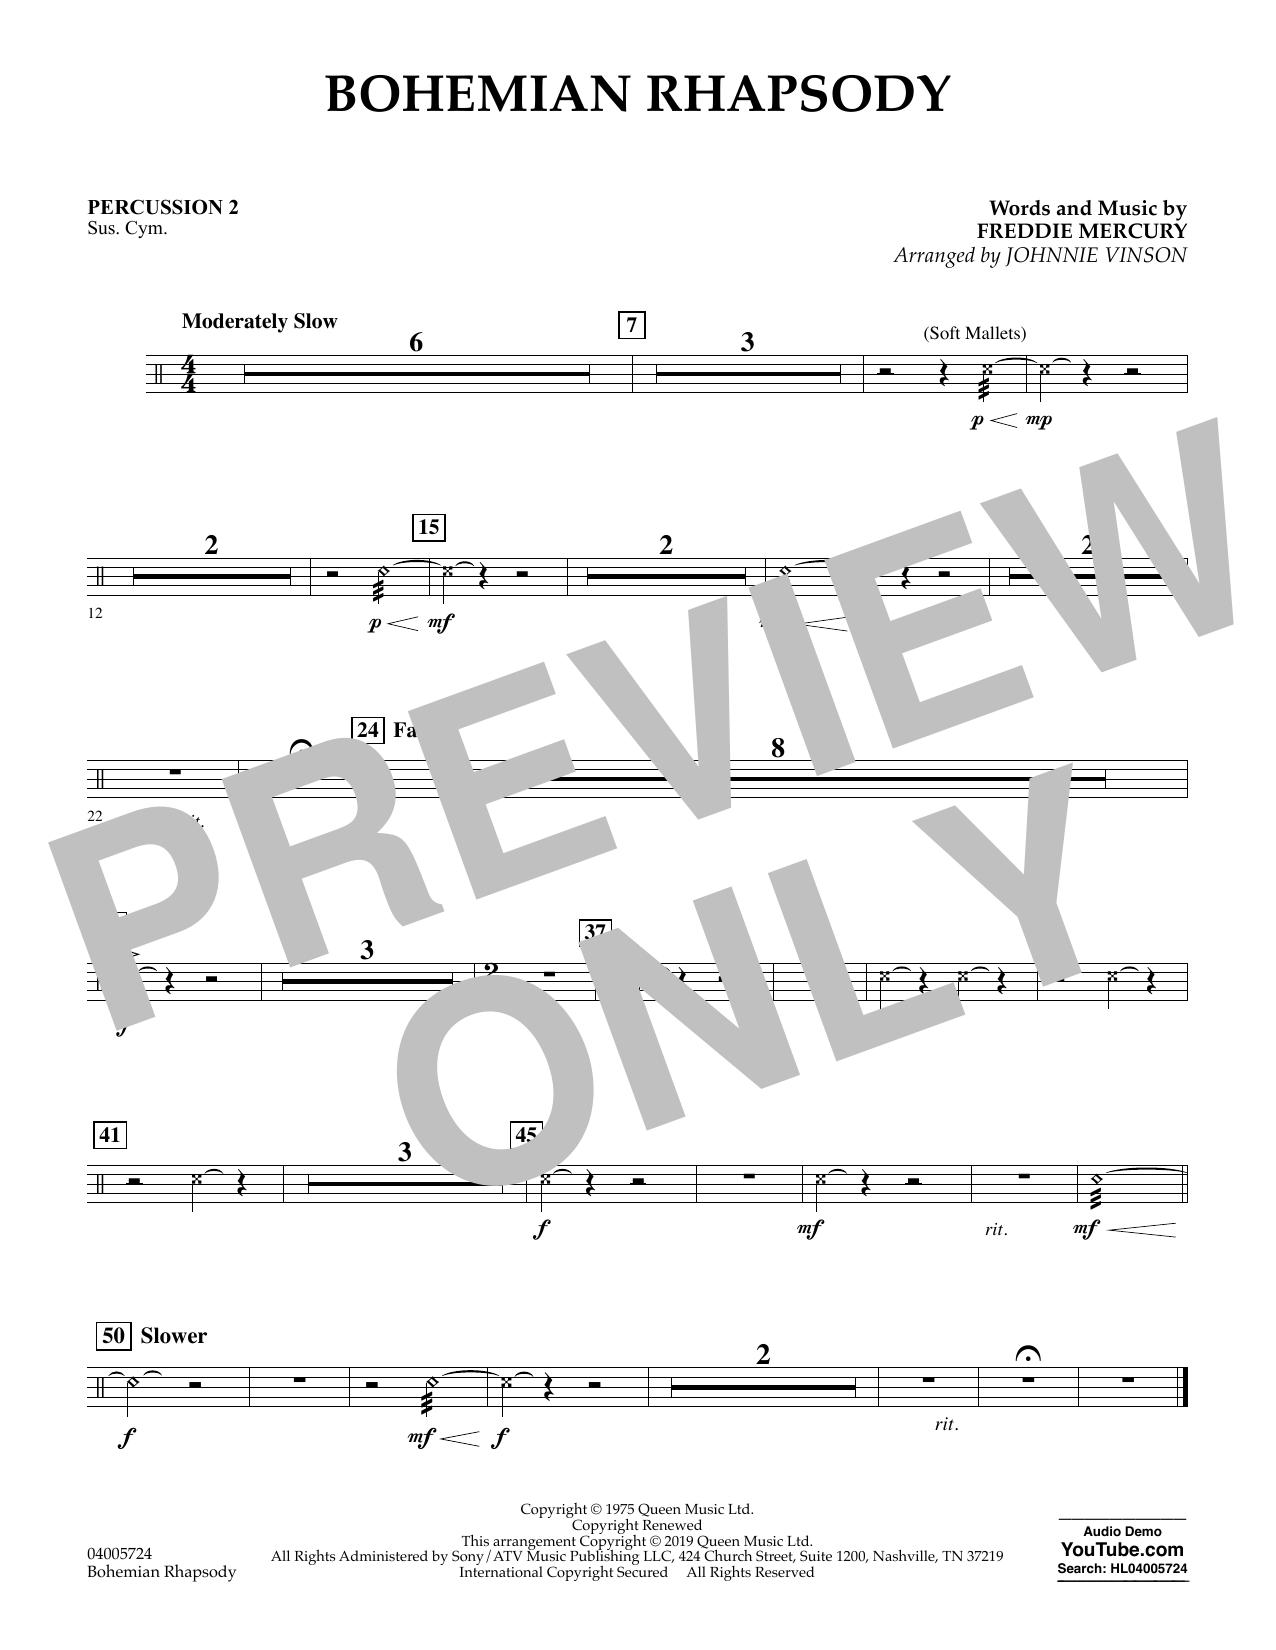 Bohemian Rhapsody (arr. Johnnie Vinson) - Percussion 2 (Concert Band)